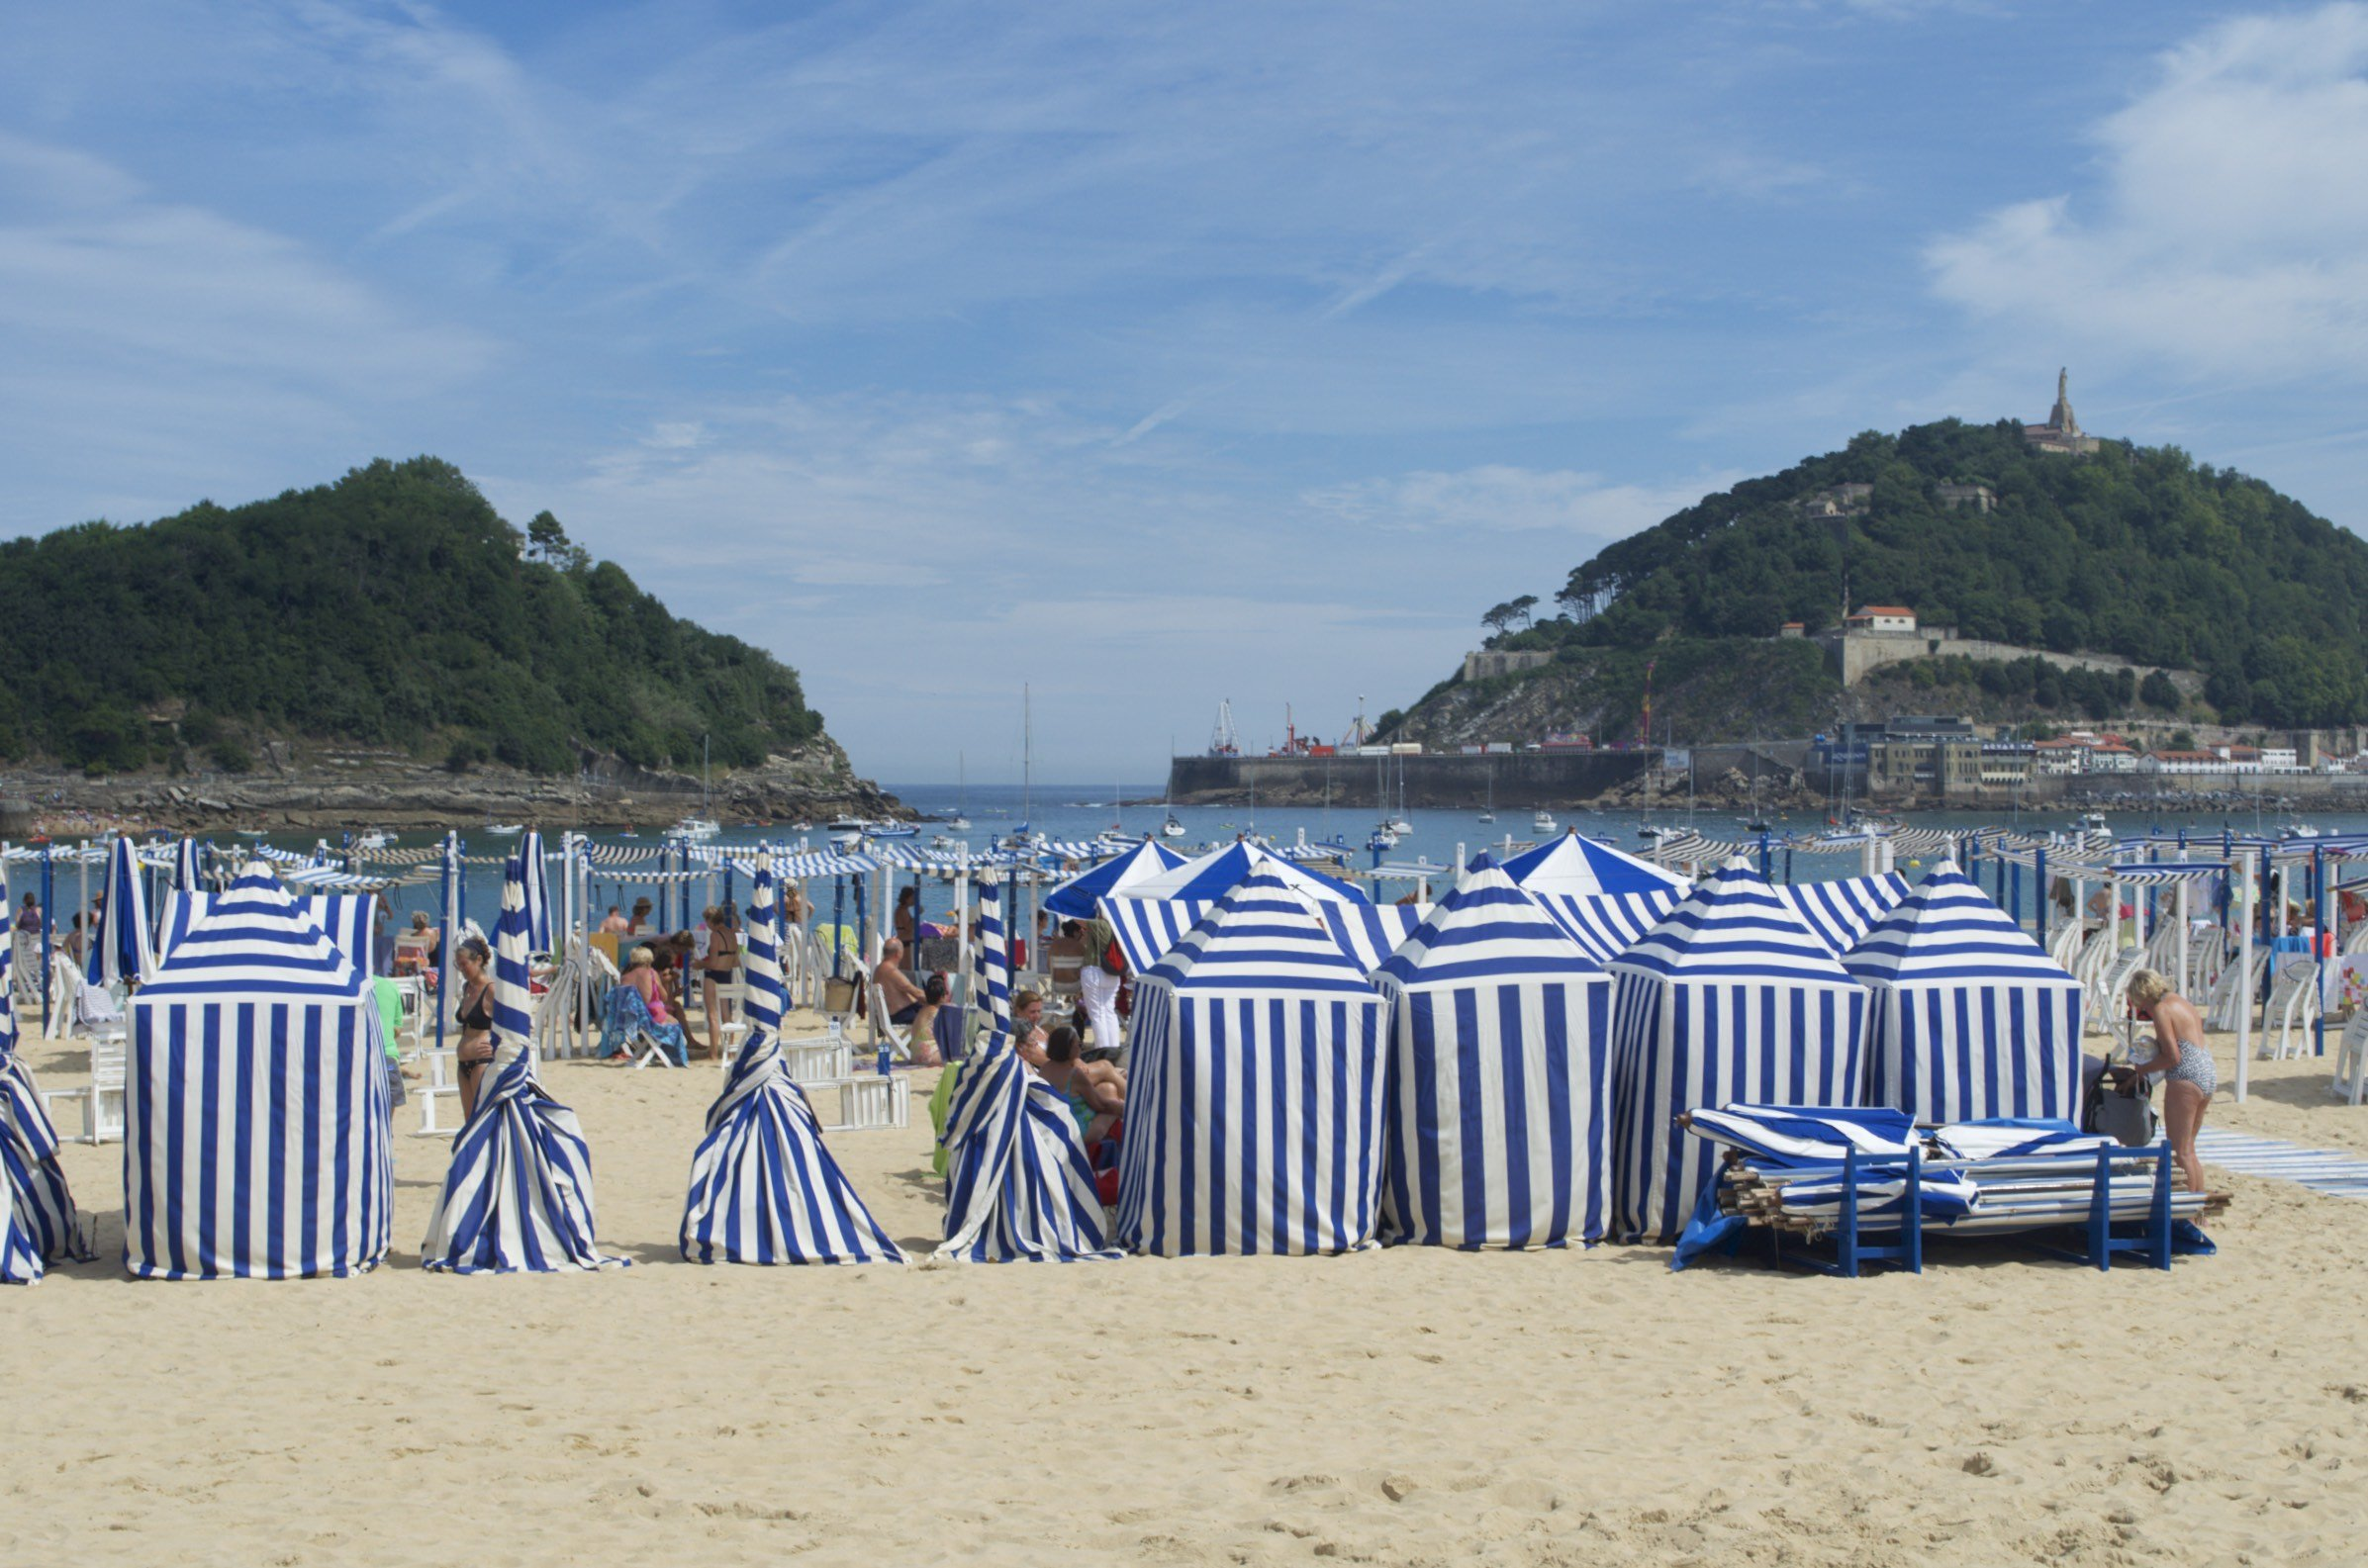 Sonnenzelte am Strand Playa de la Concha